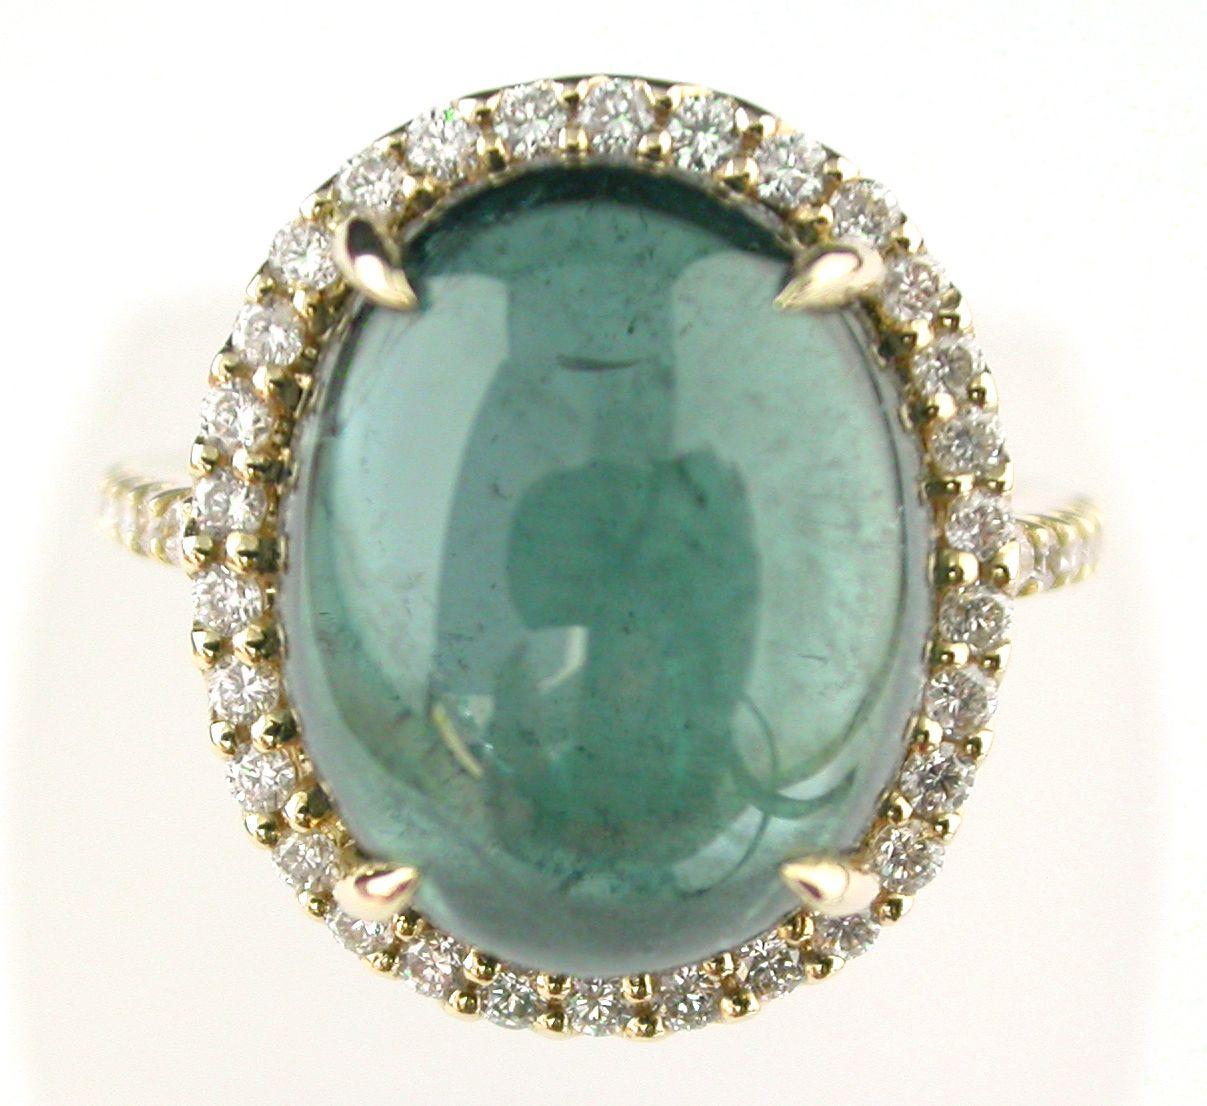 Tourmaline and Diamond Ring @Larc Jewelers #larcjewelers